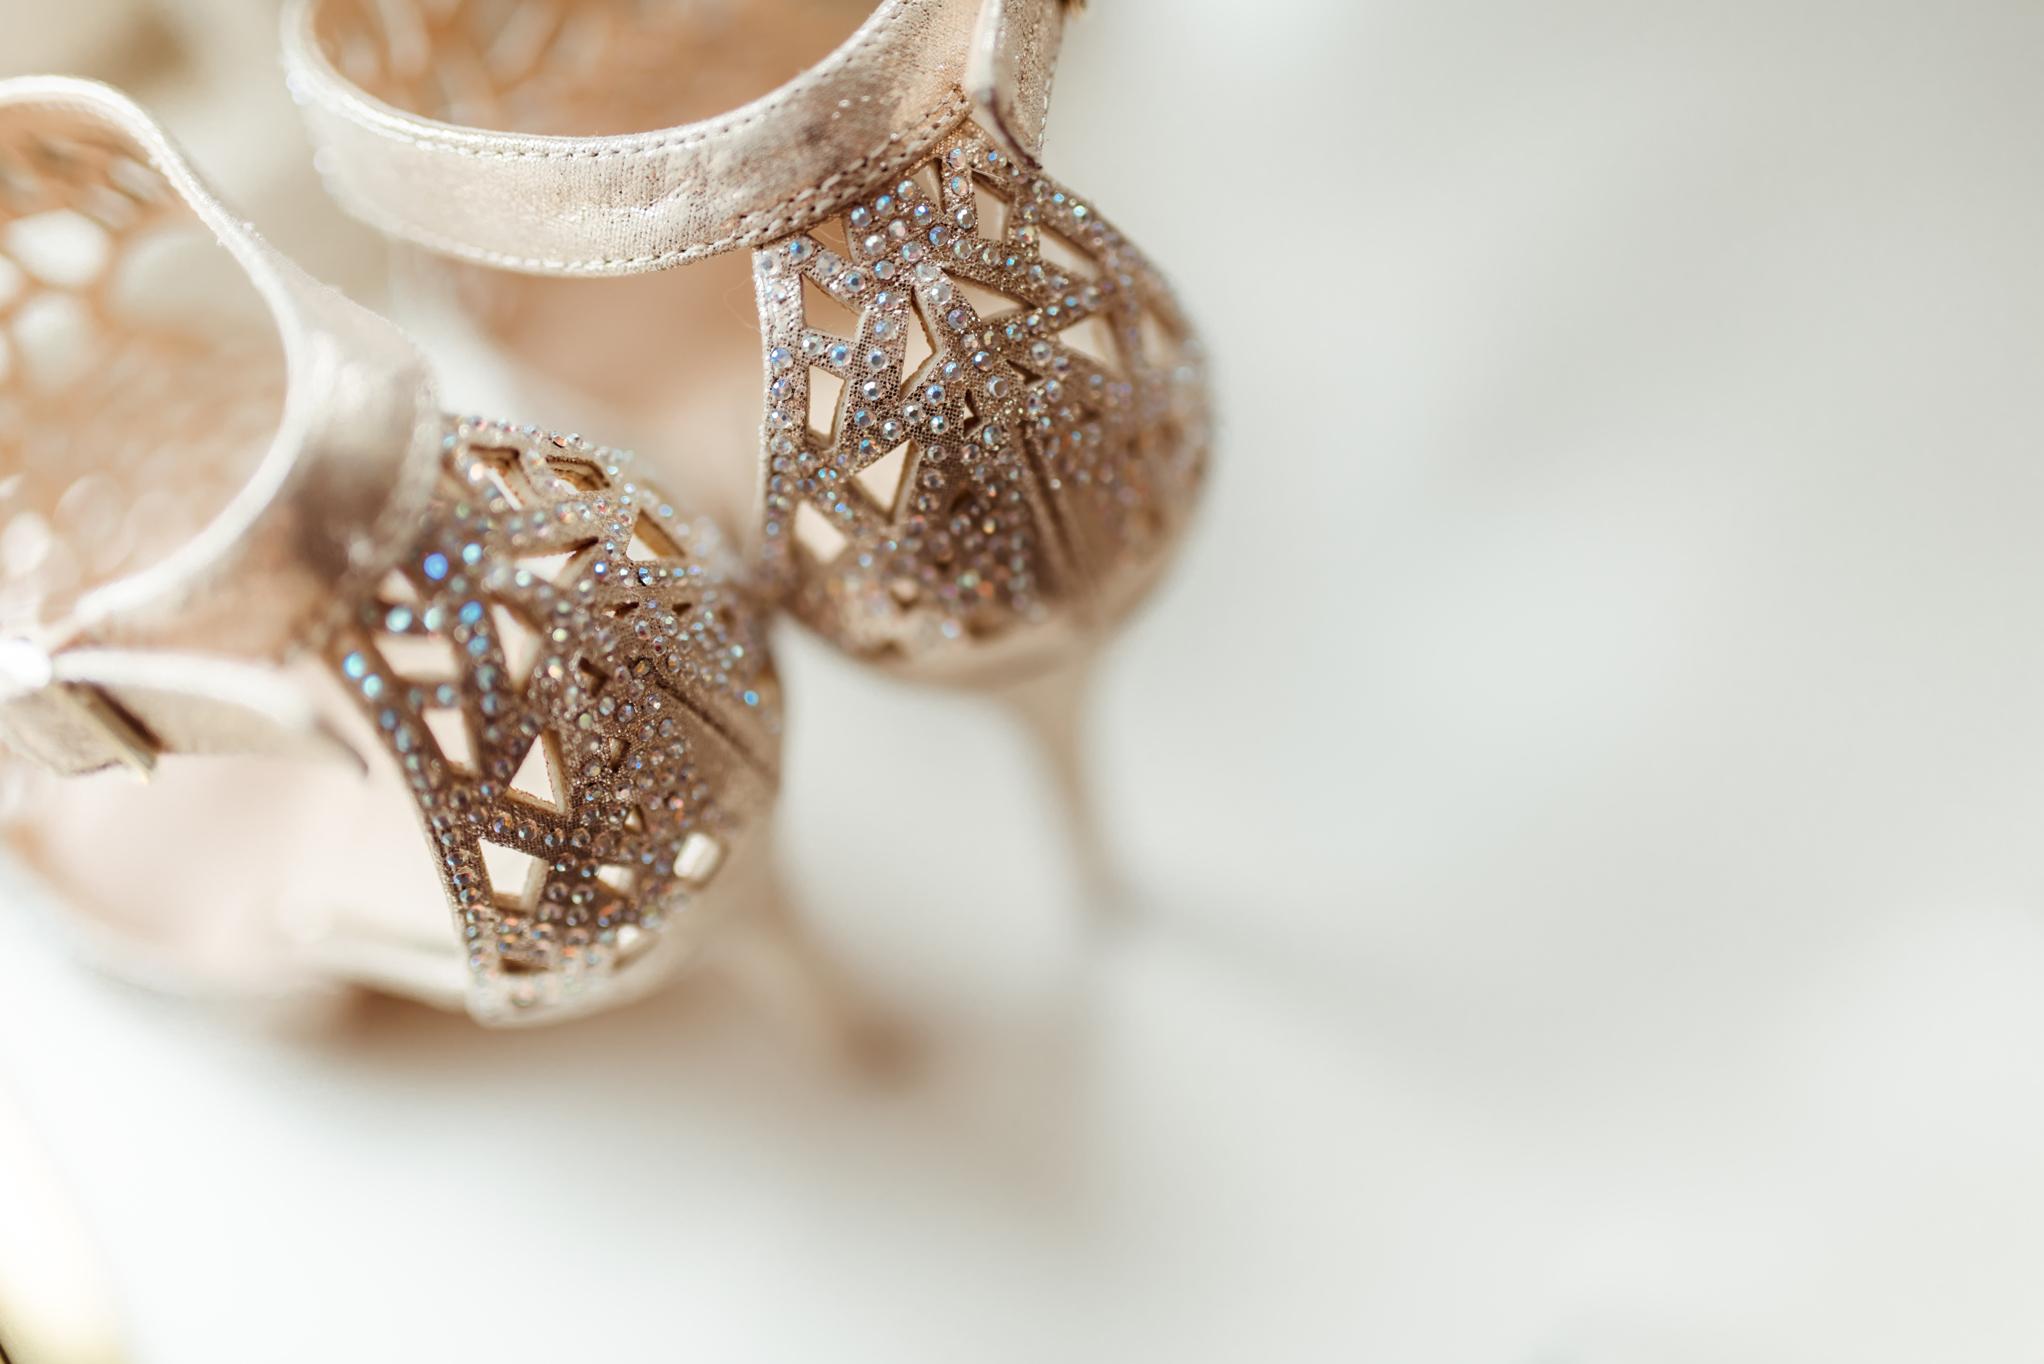 jessica-simpson-wedding-shoes.jpg